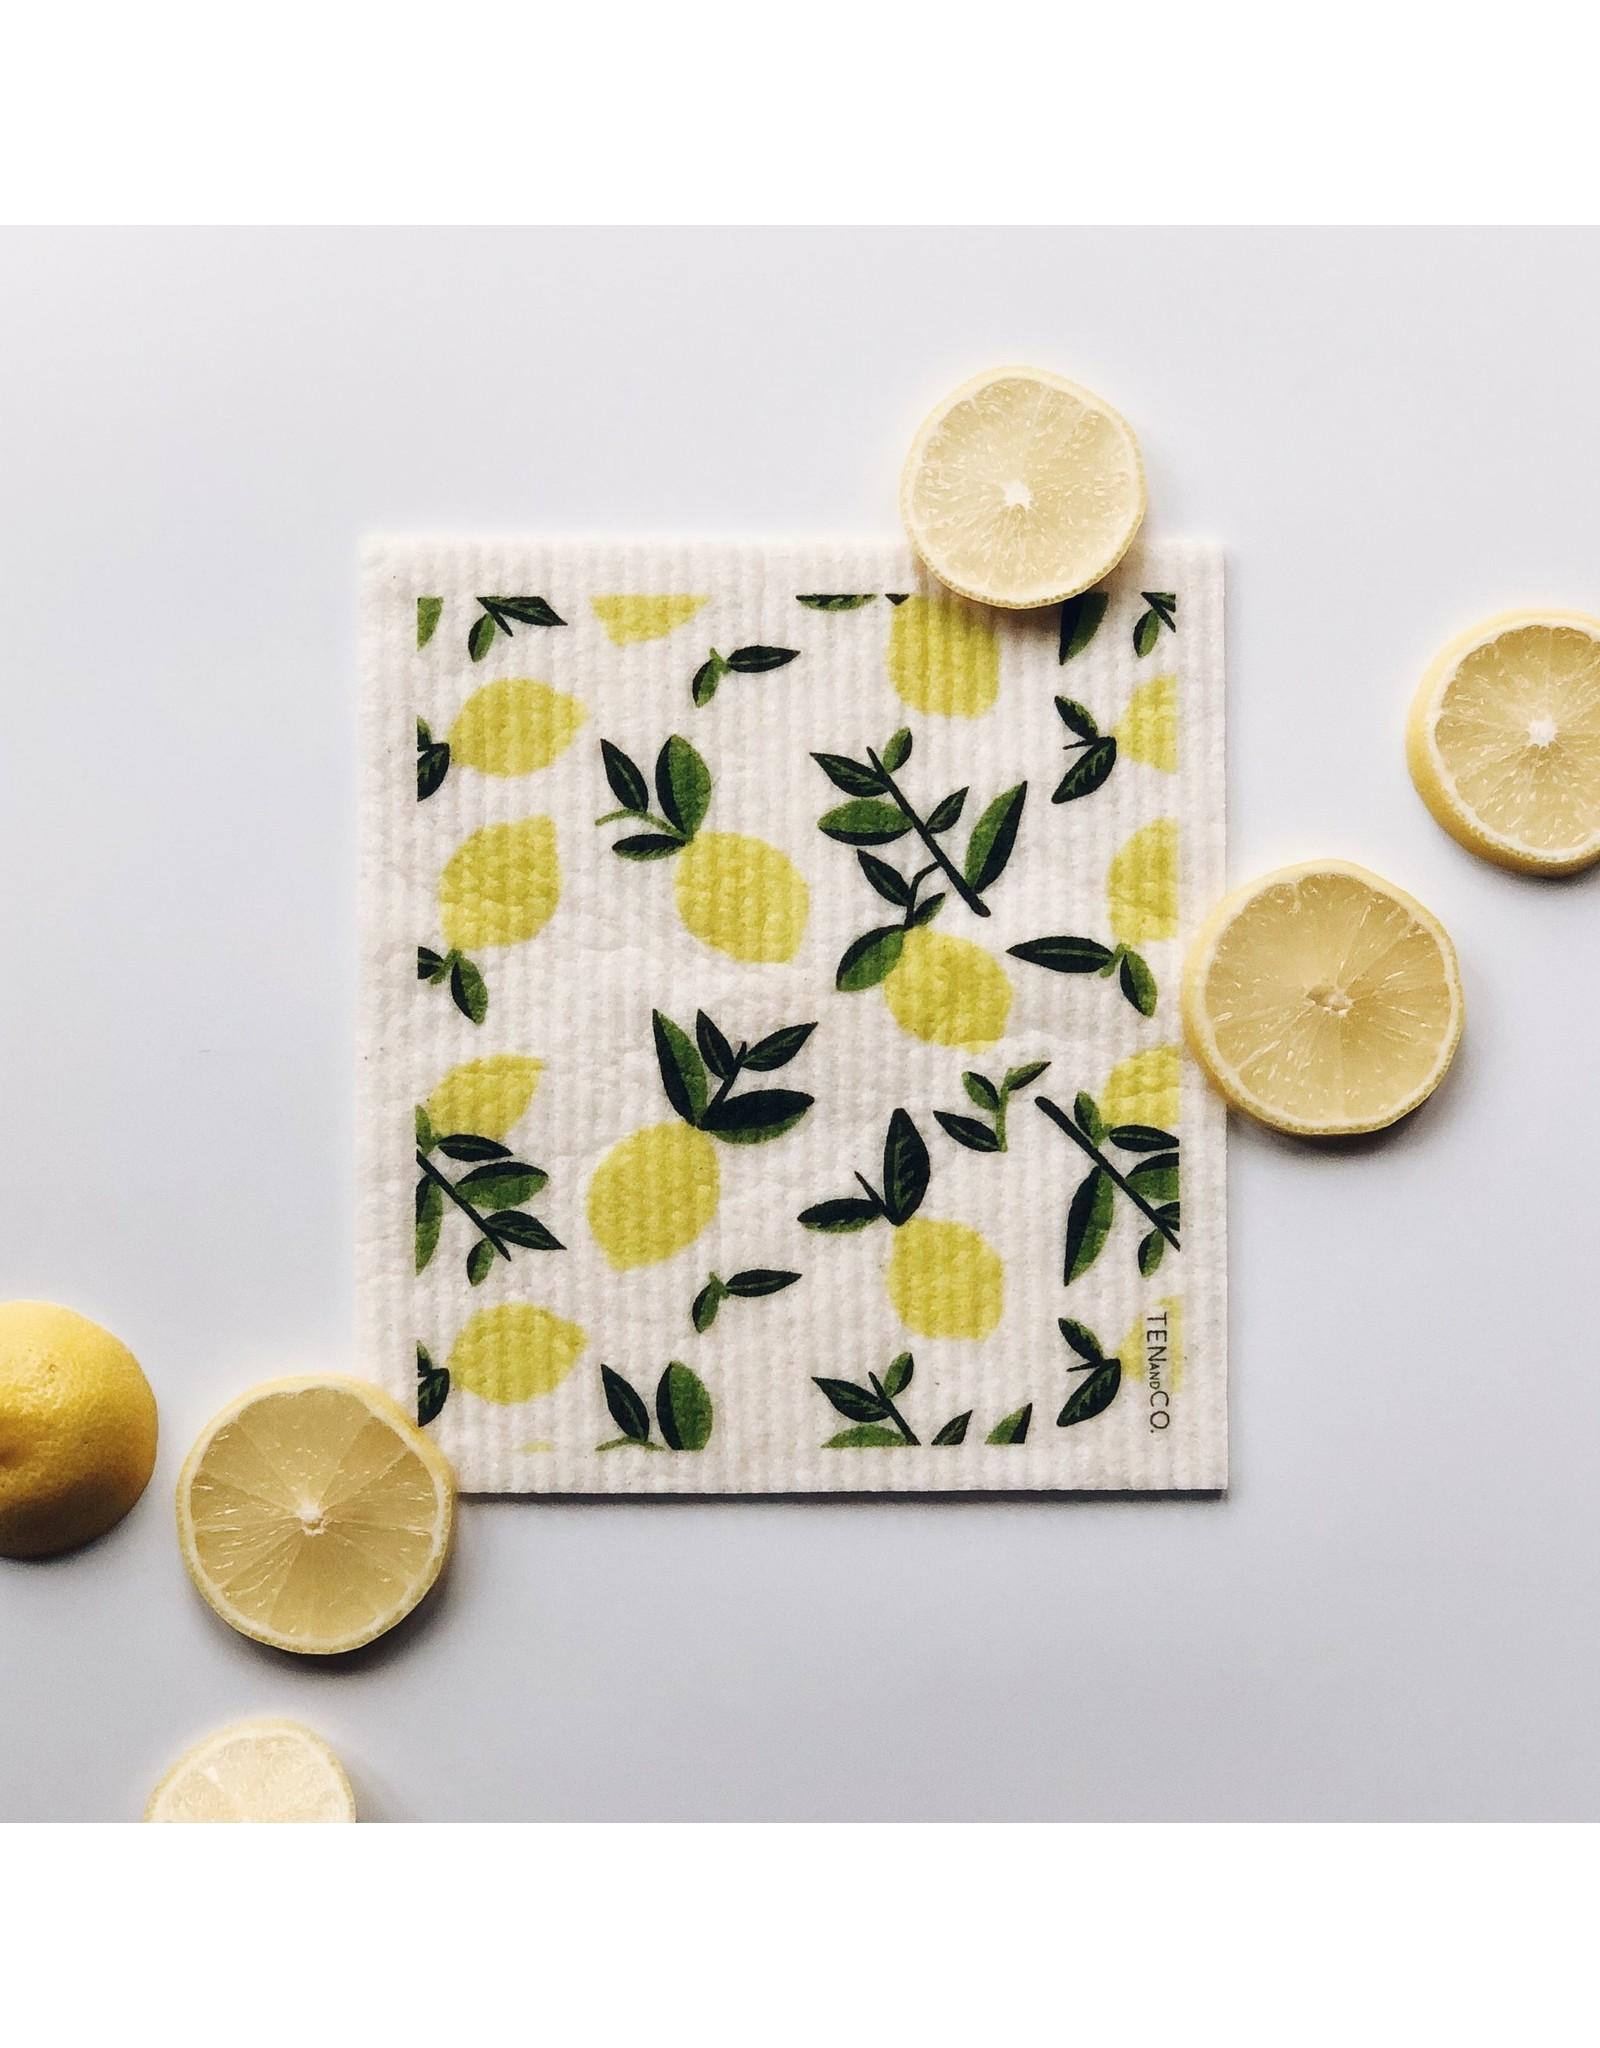 Ten & Co SMALL Citrus Lemon Sponge Cloth